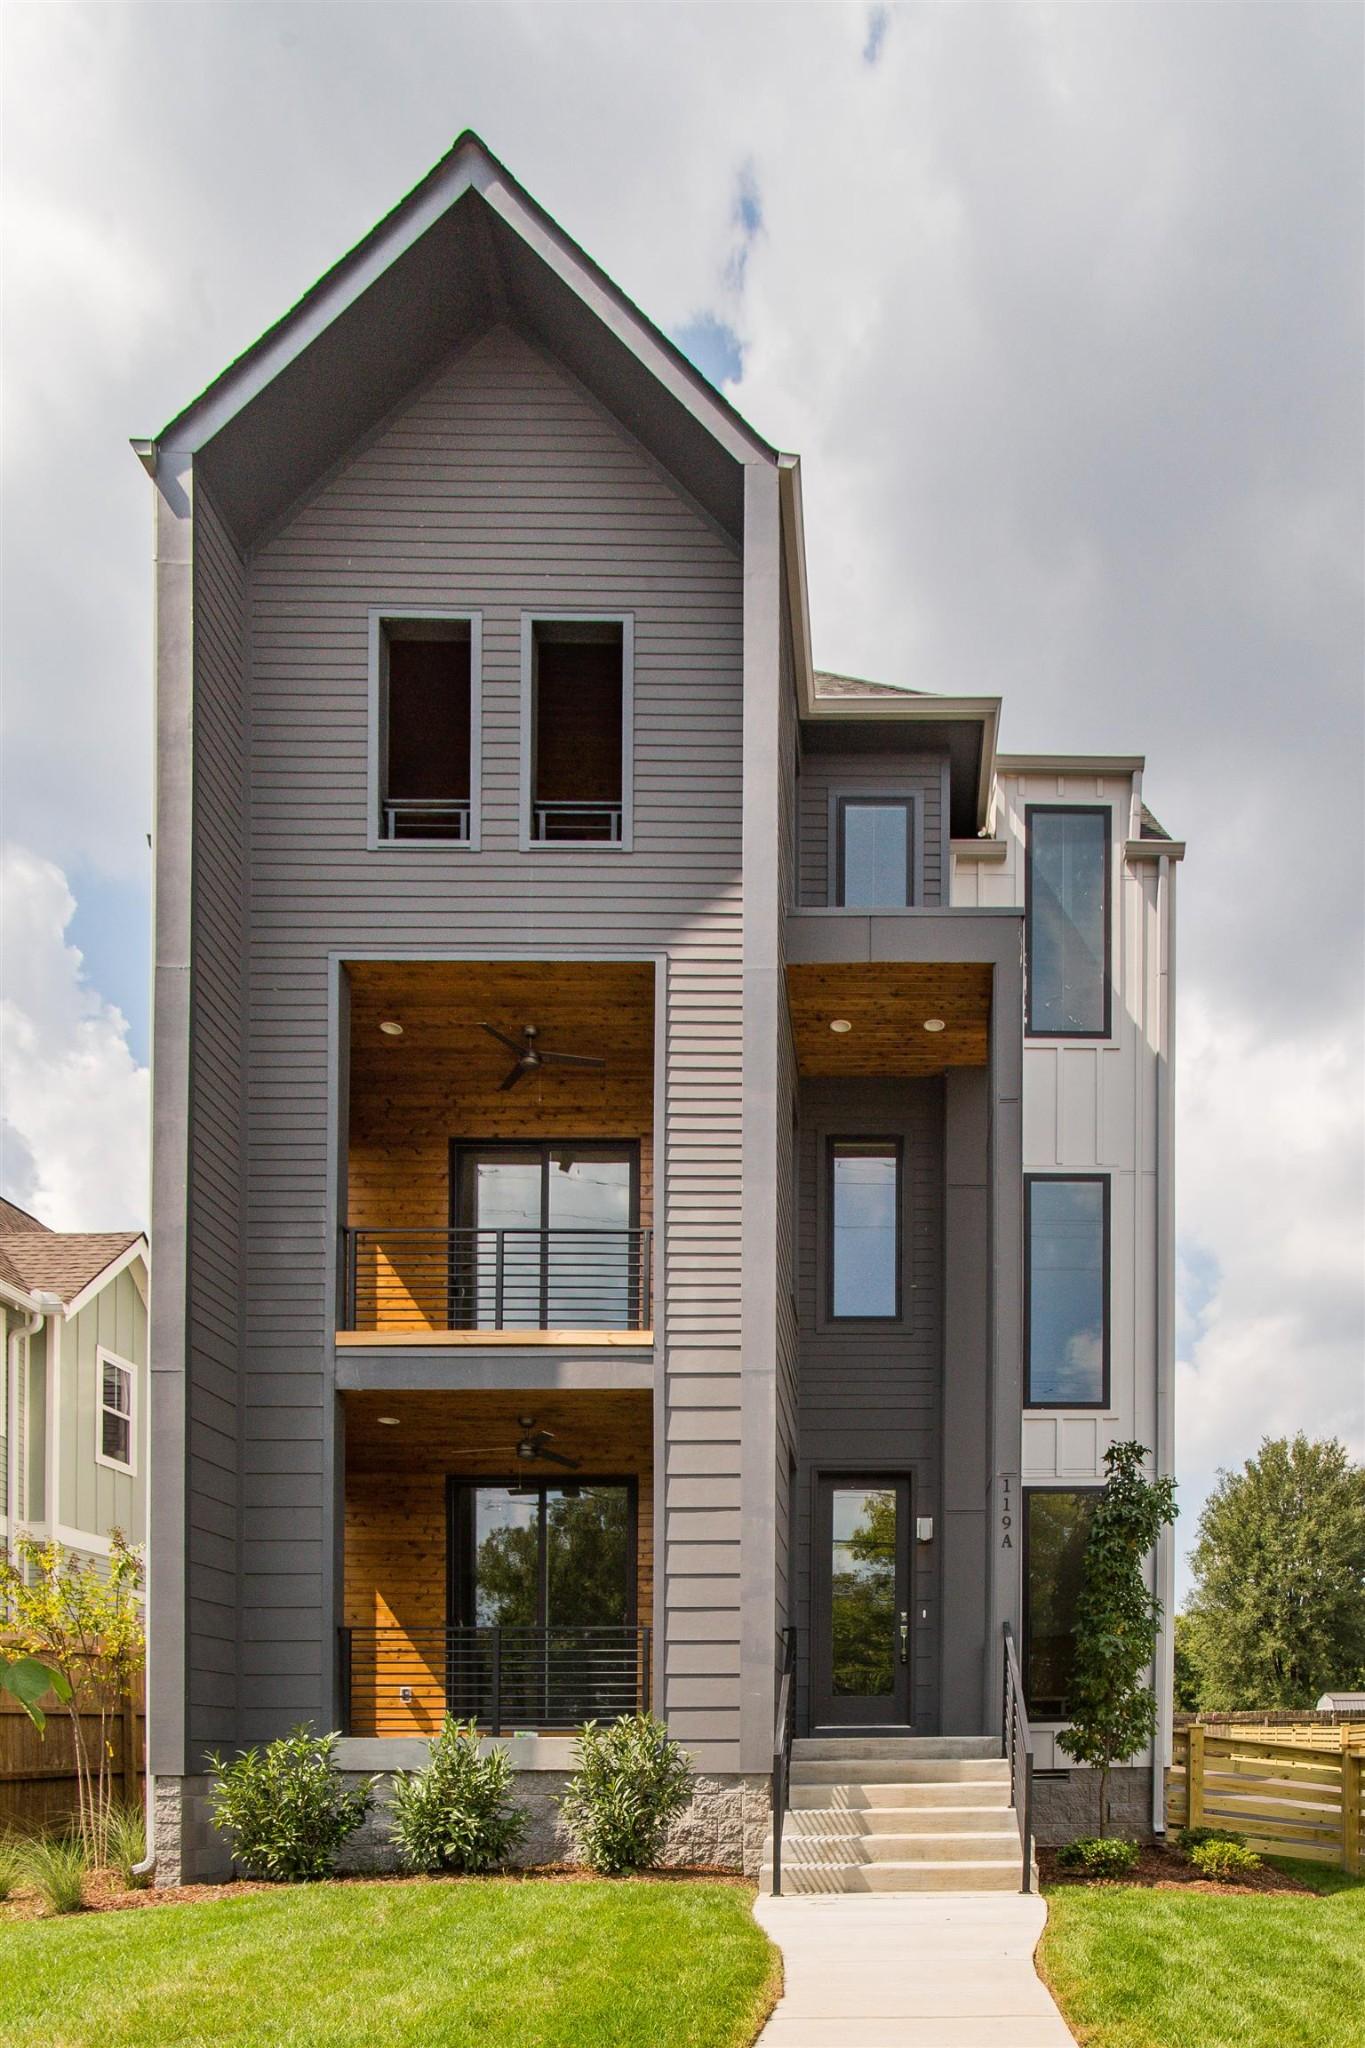 117 Rains Ave, Nashville, TN 37203 - Nashville, TN real estate listing